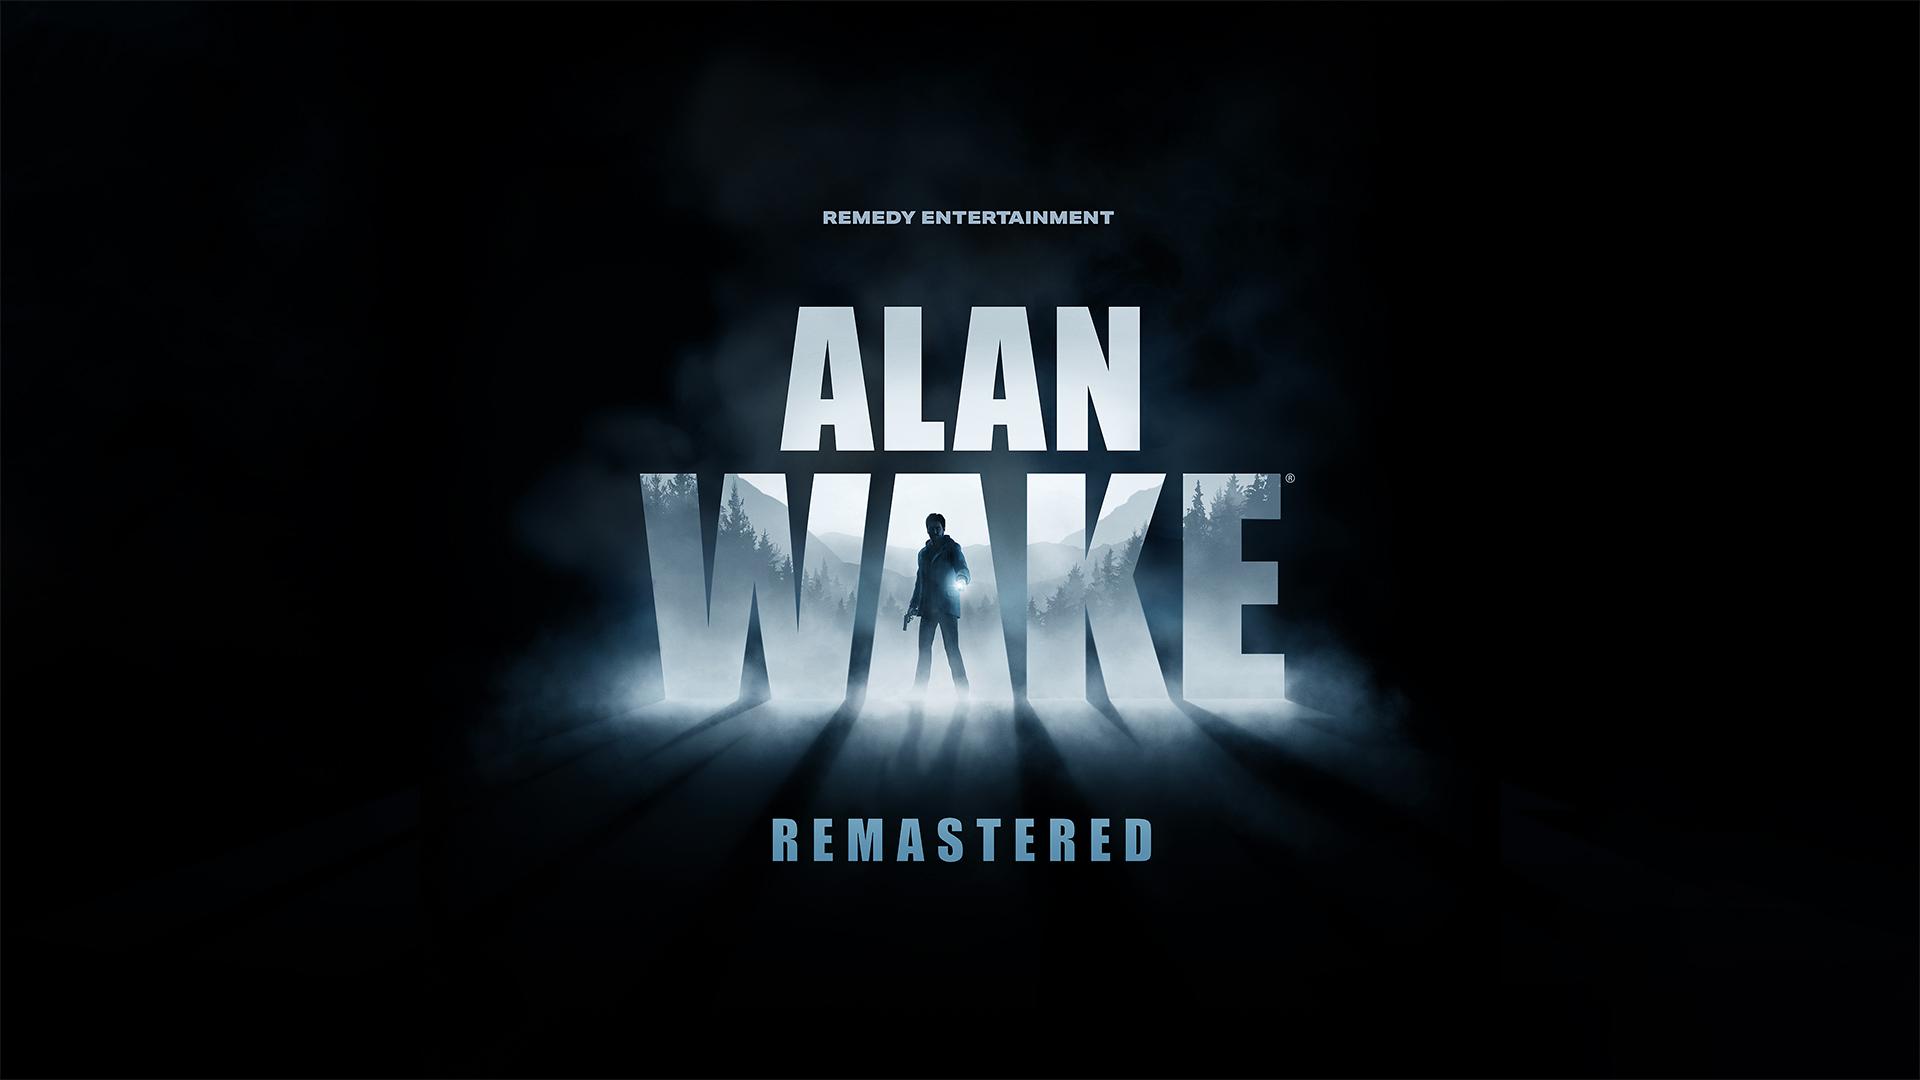 www.alanwake.com